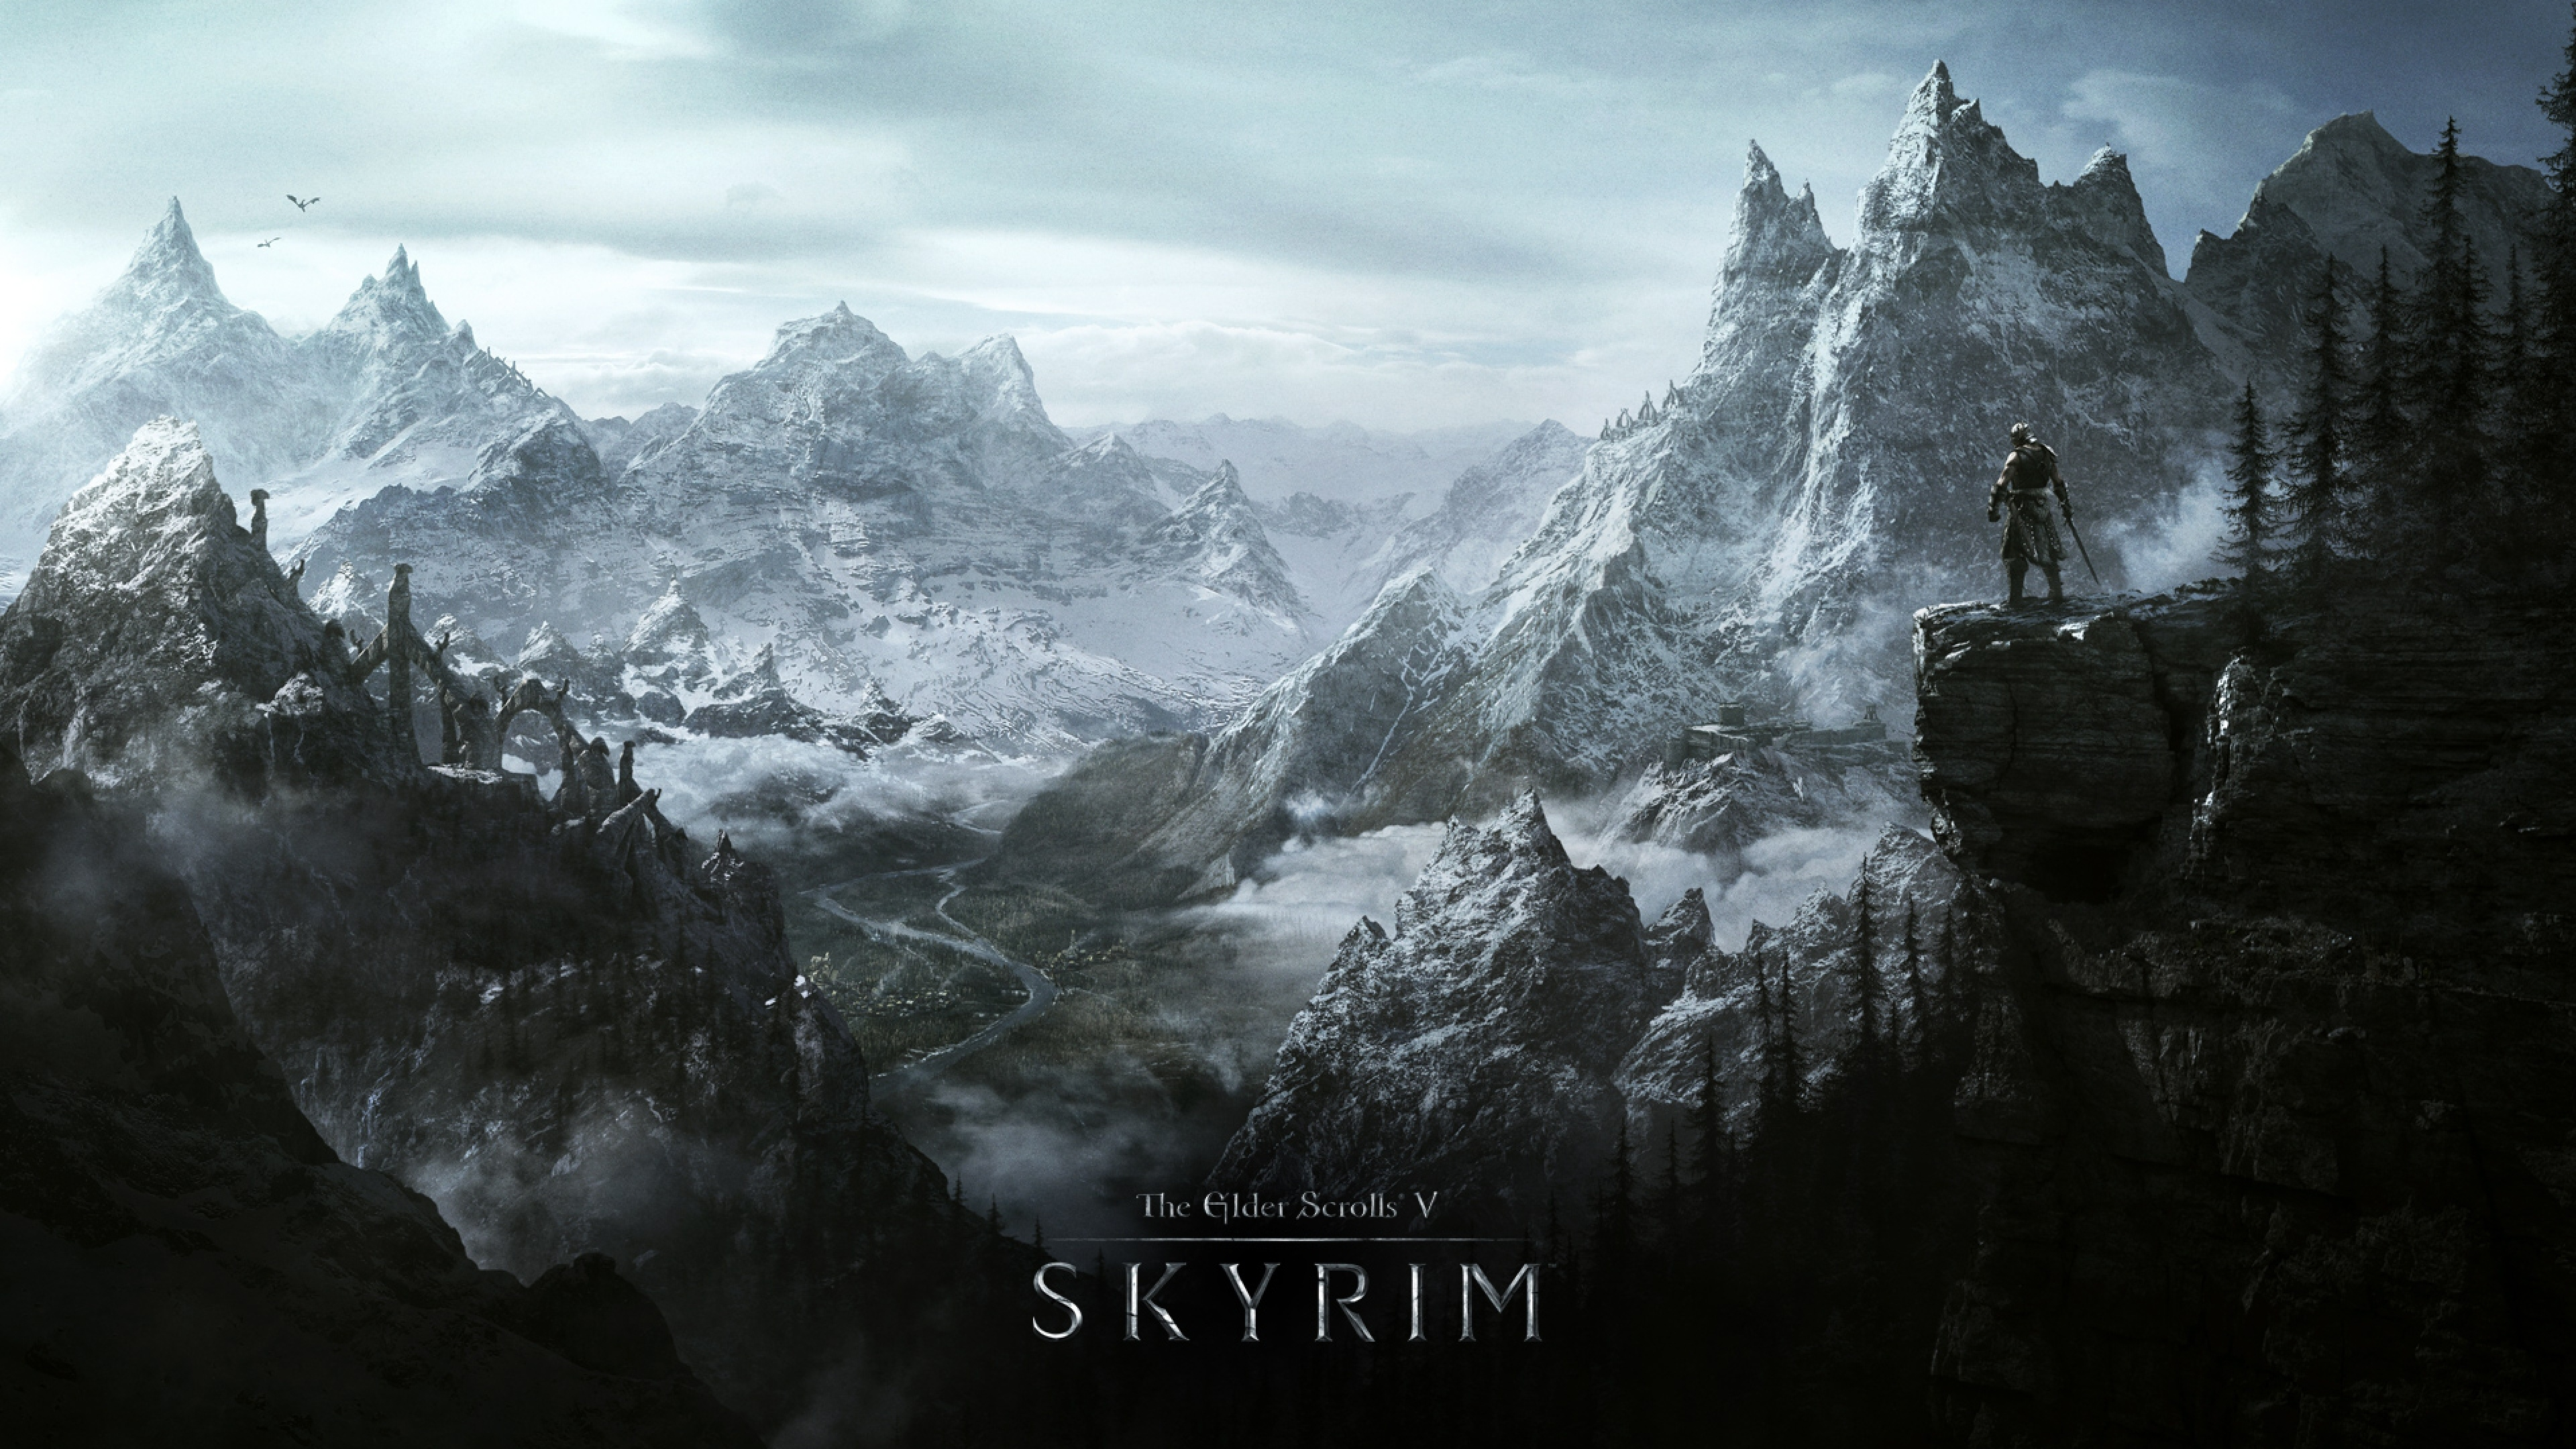 Skyrim World Rocks Winter Cold The elder scrolls v skyrim 4K 3840x2160